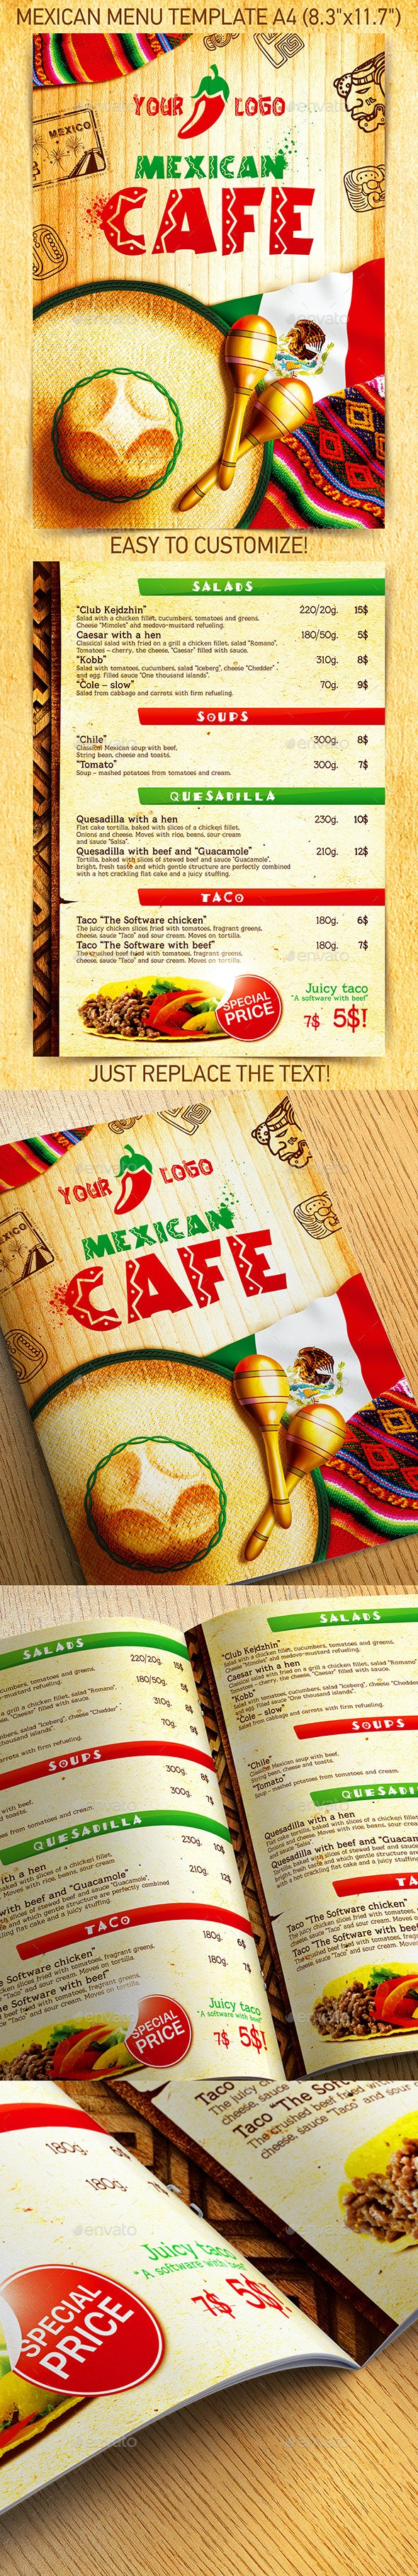 Mexican Menu Template vol.2 - Food Menus Print Templates